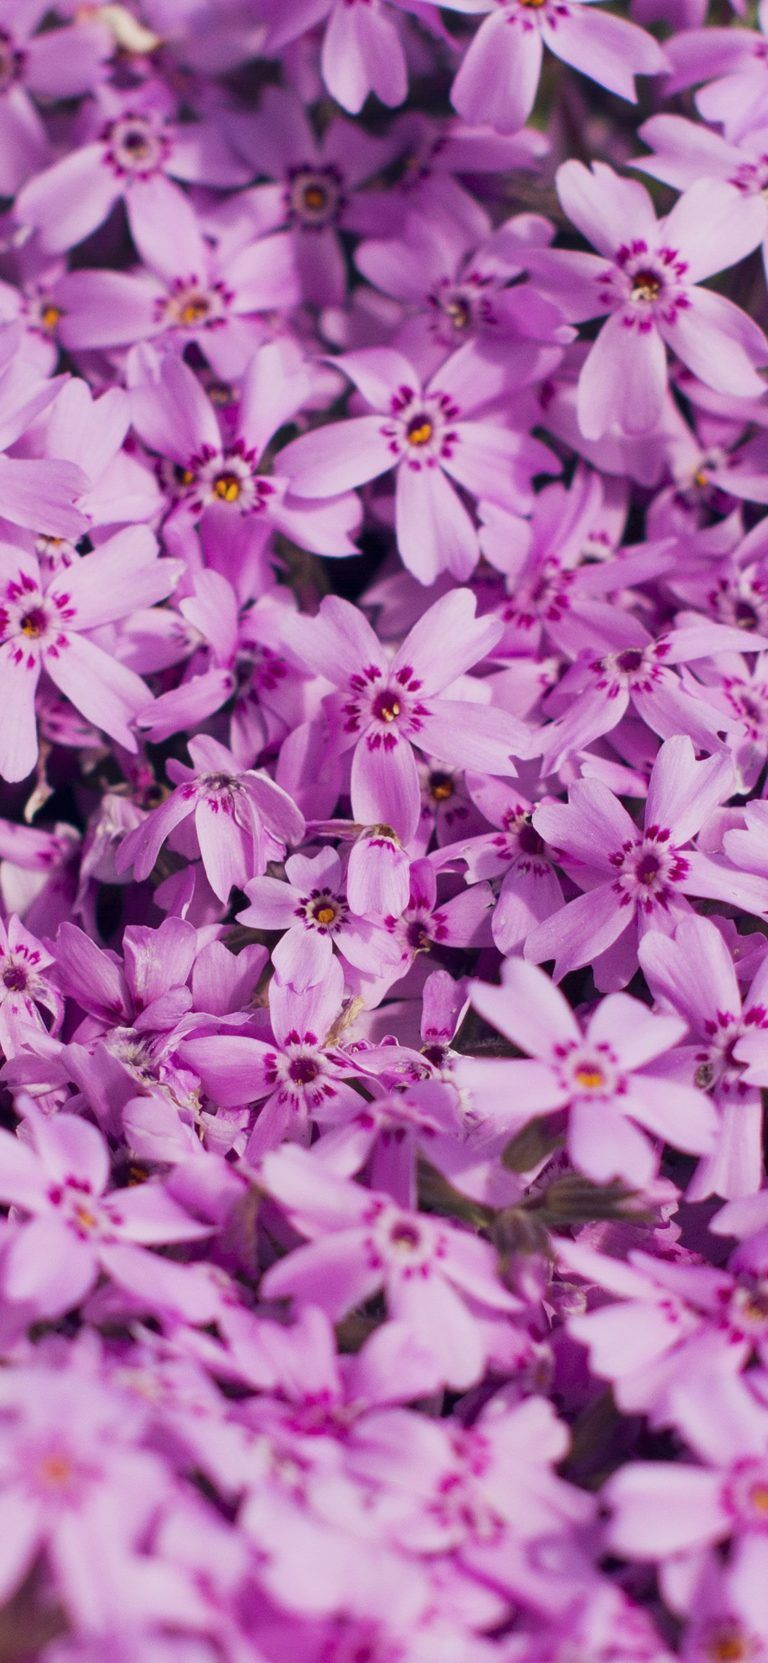 Iphone X Wallpaper Hd 1080p Flower Tecnologist Spring